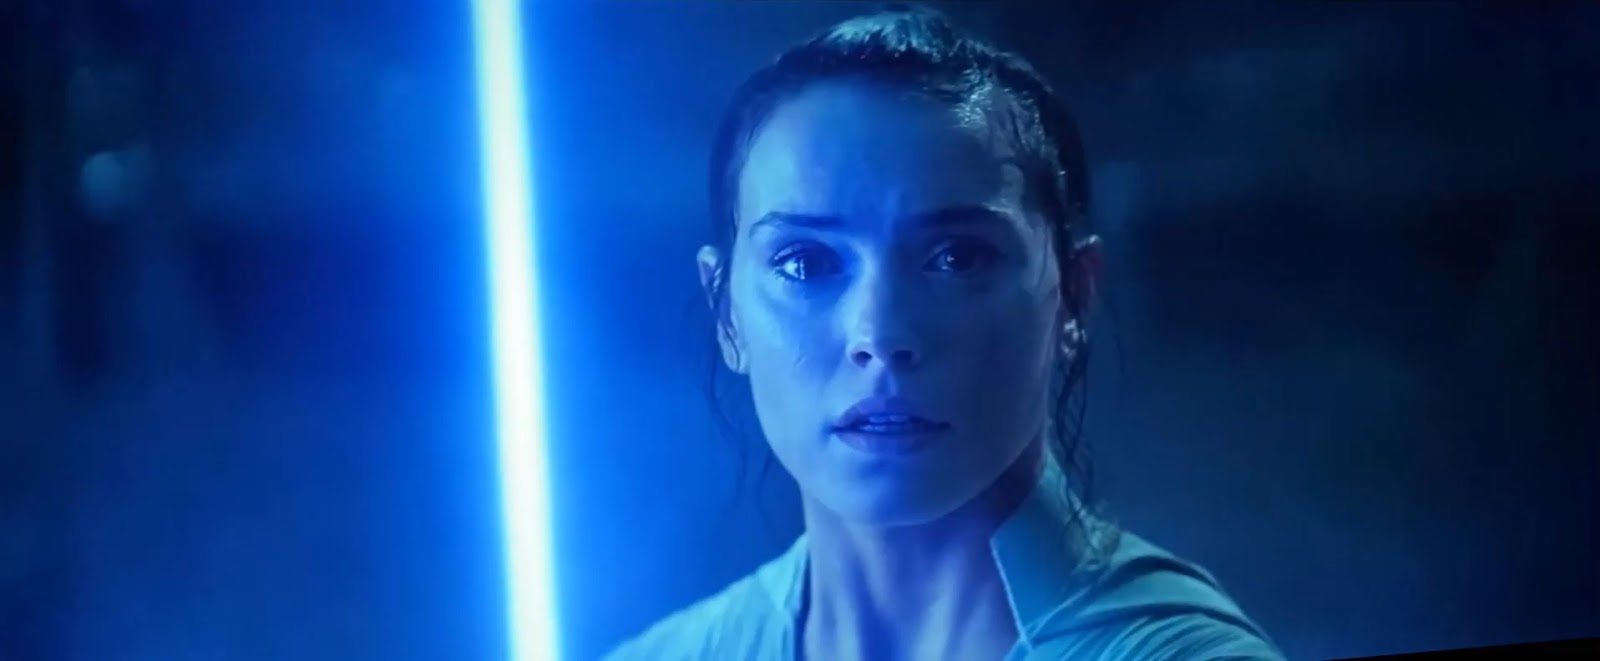 Star+Wars+El+ascenso+de+Skywalker+%282019%29+HDTS+1080p+Latino+-+Ingles.mkv_snapshot_01.50.58.433.jpg (1600×661)